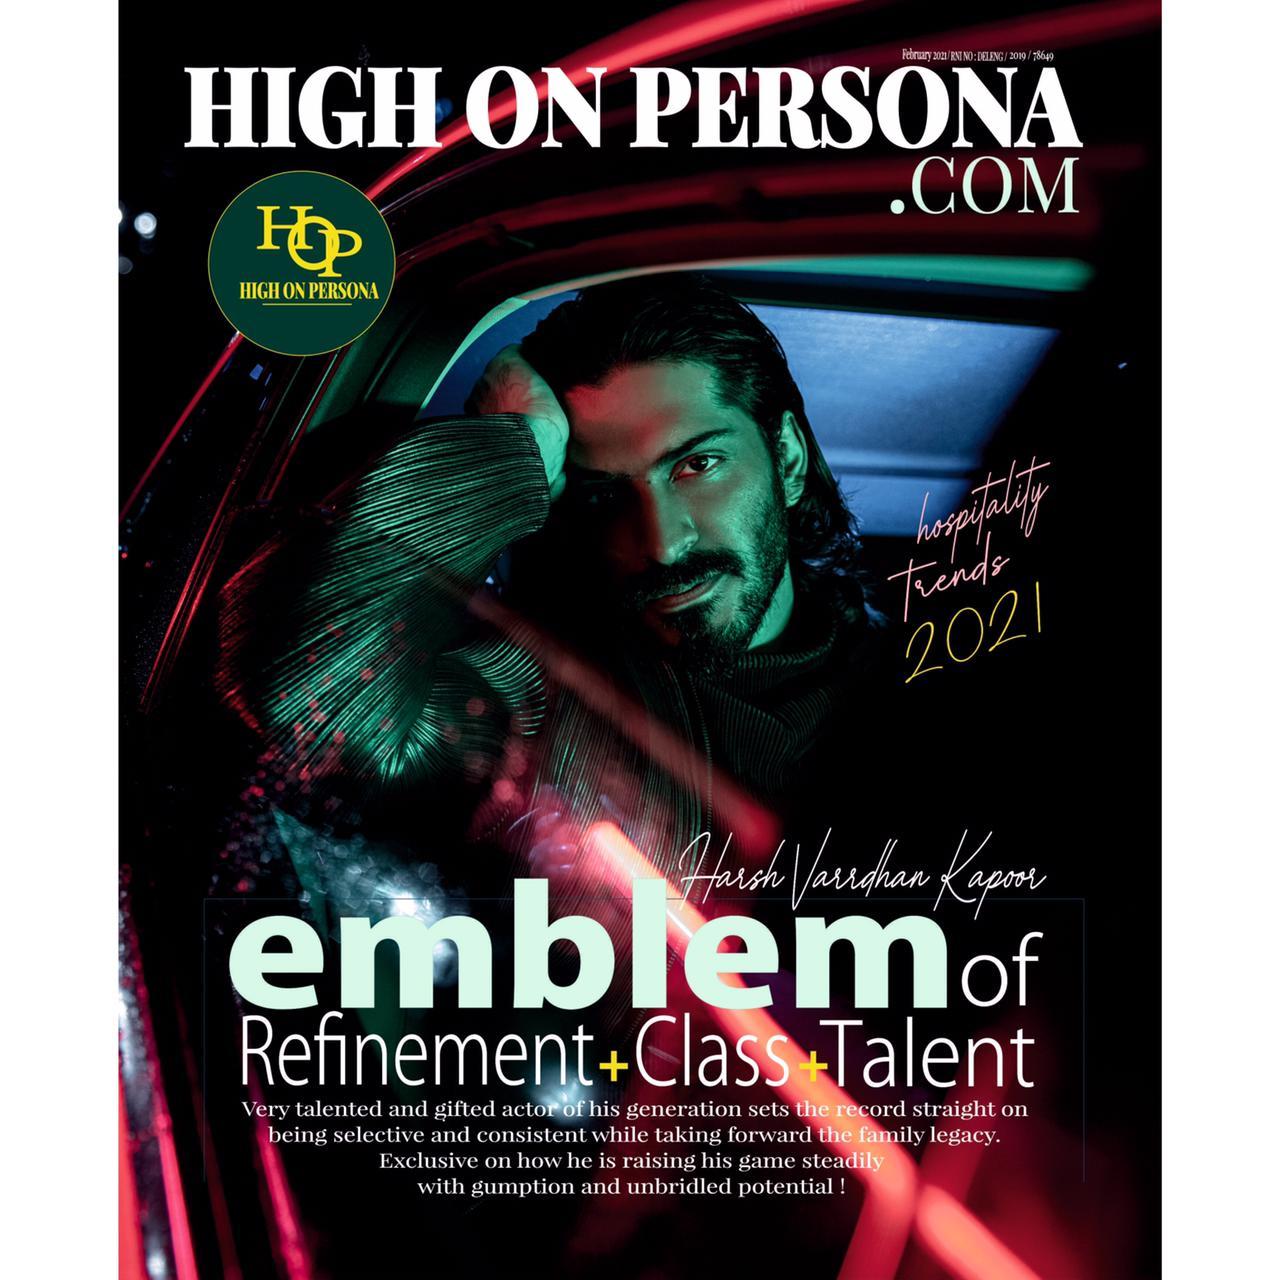 Harshvarrdhan Kapoor High On Persona Magazine Cover